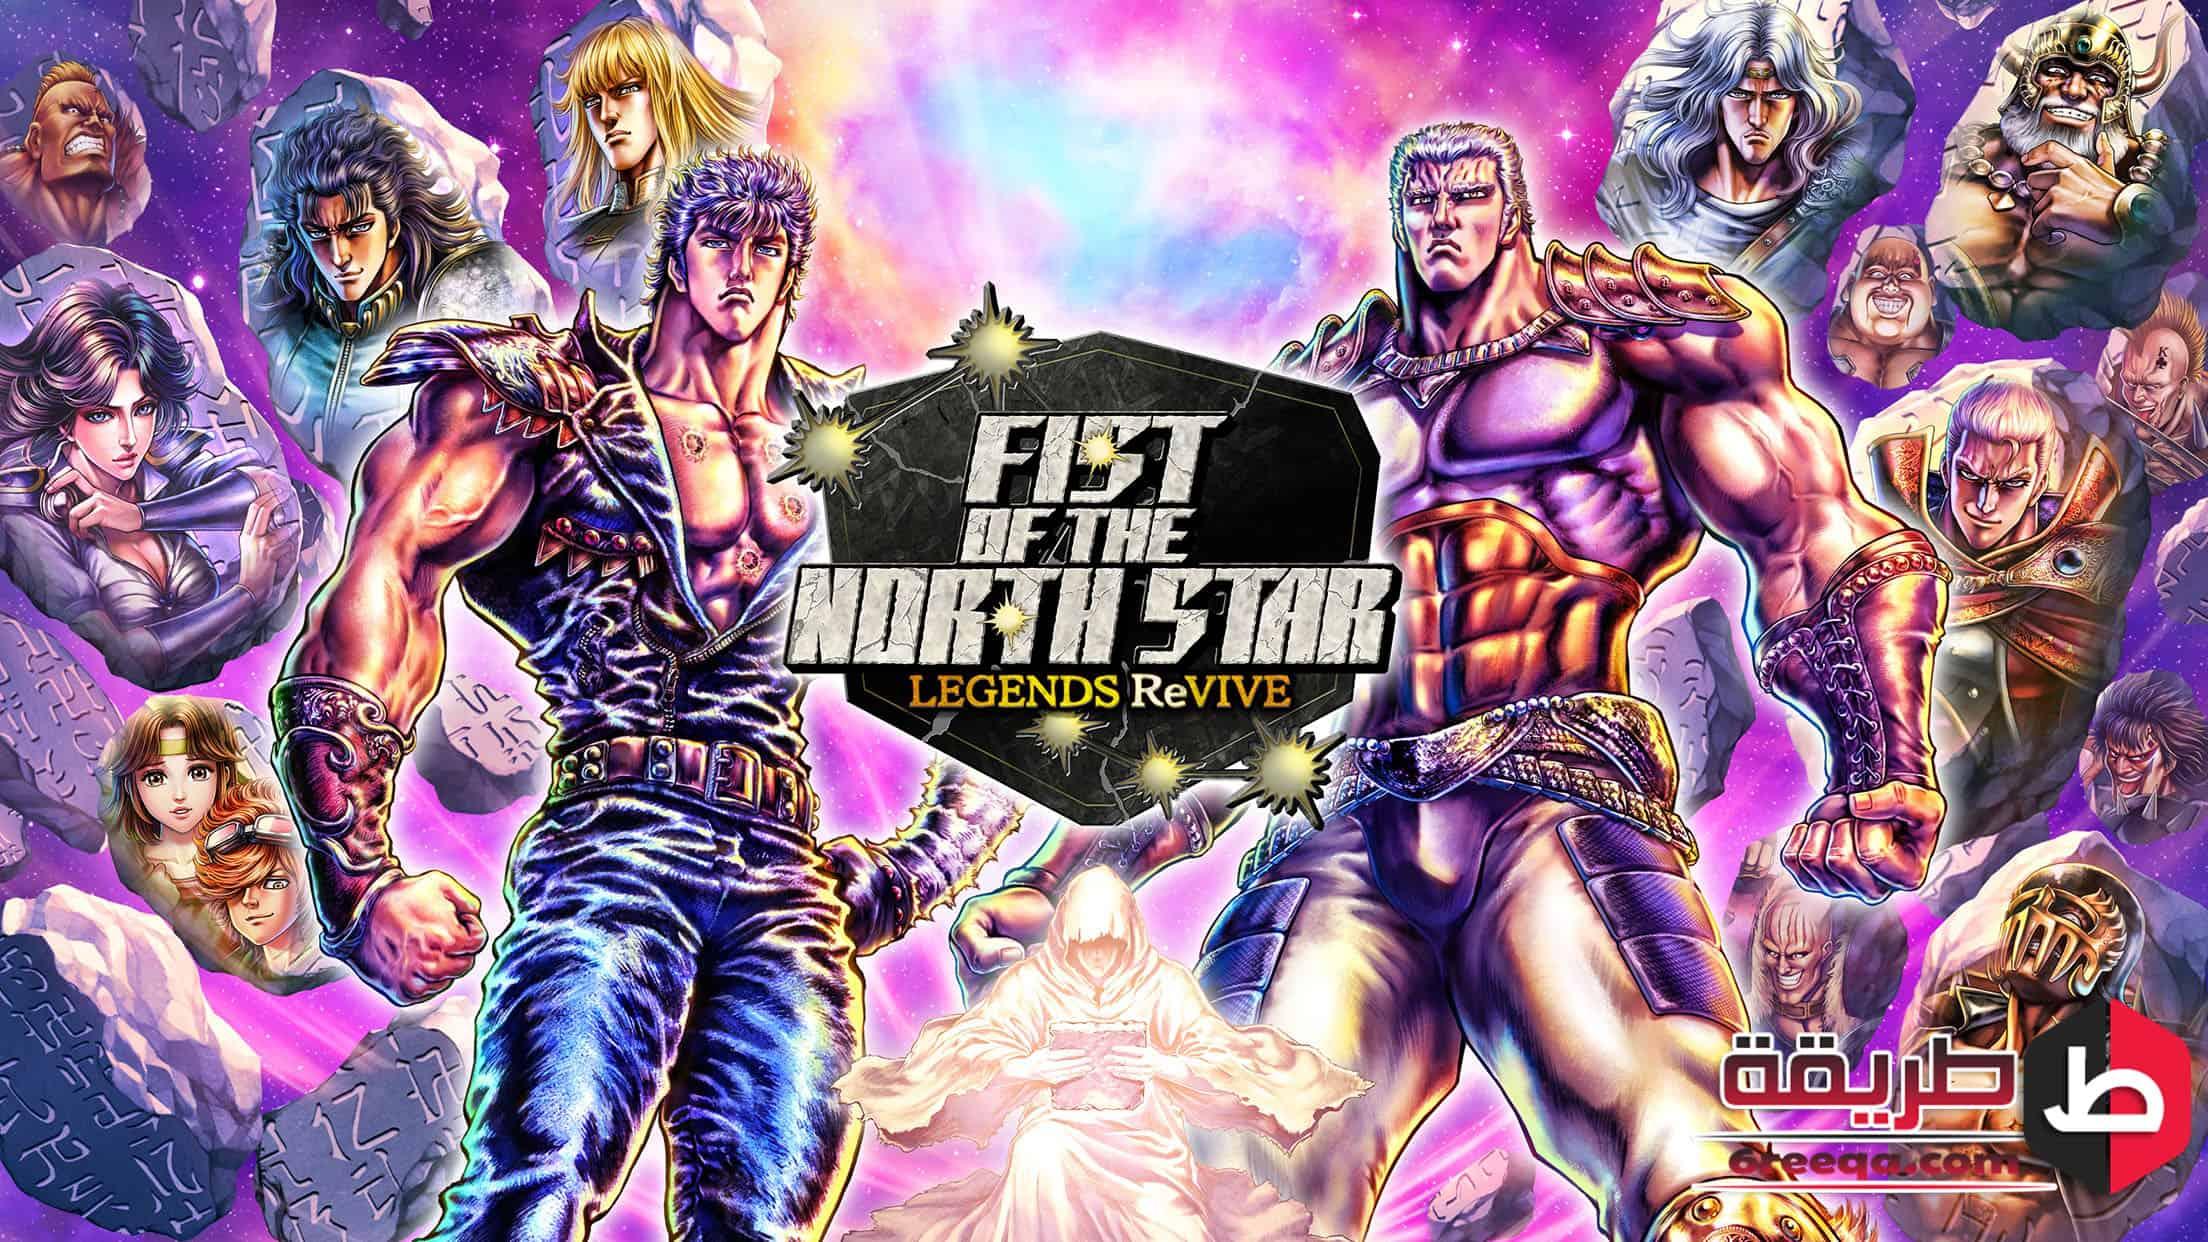 Fist of North star